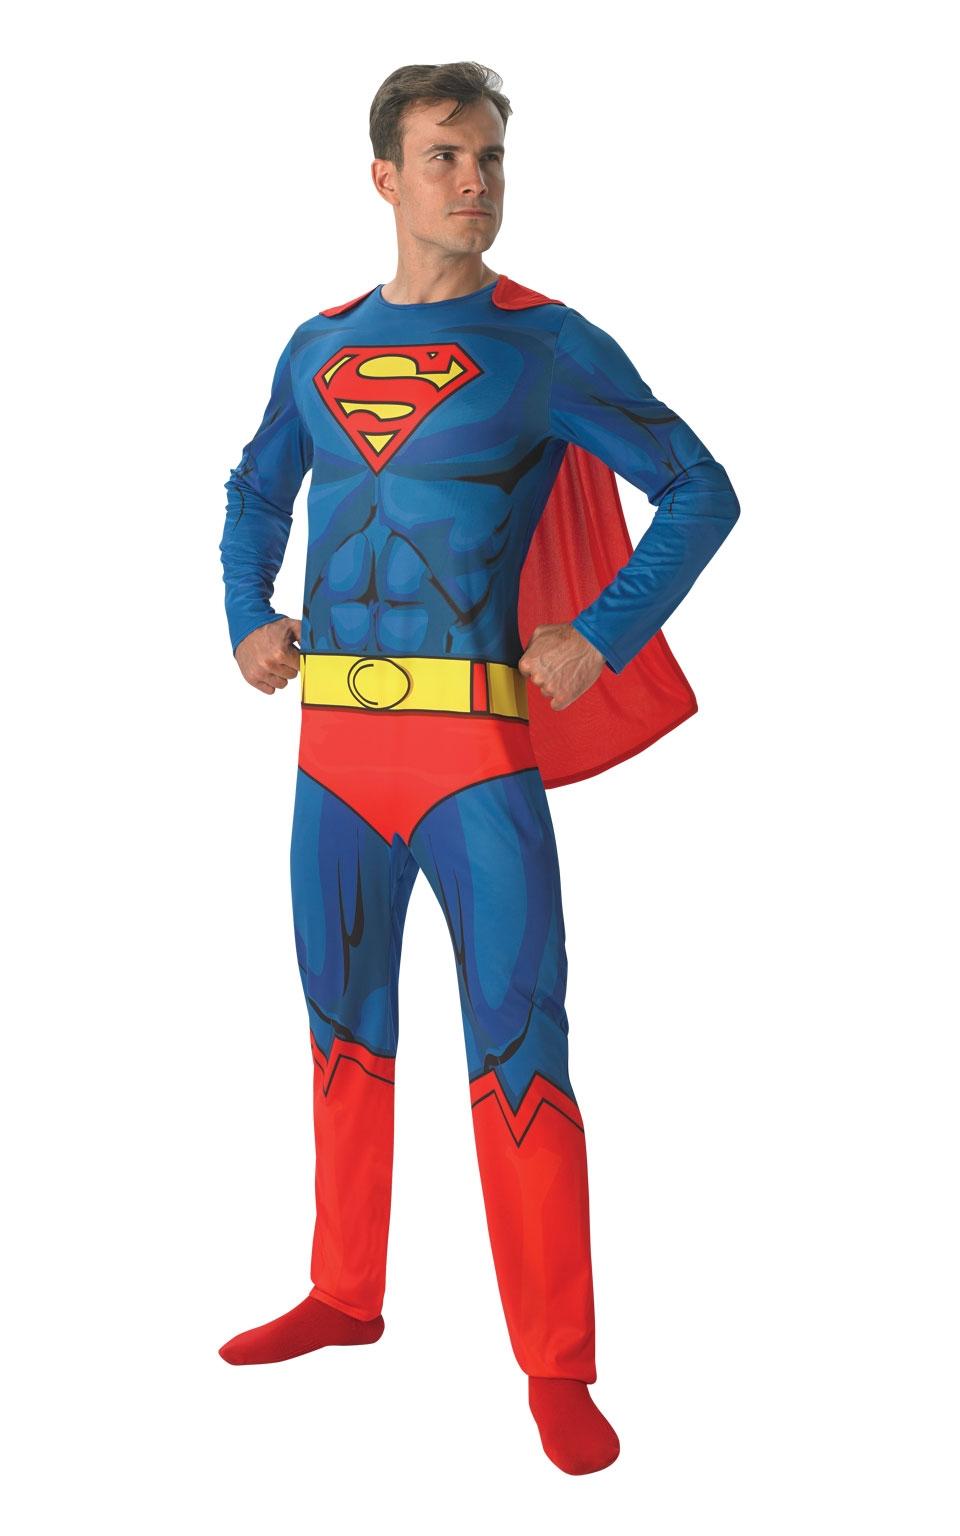 Костюм Супермена Comic book (48-50) -  Супергерои и комиксы